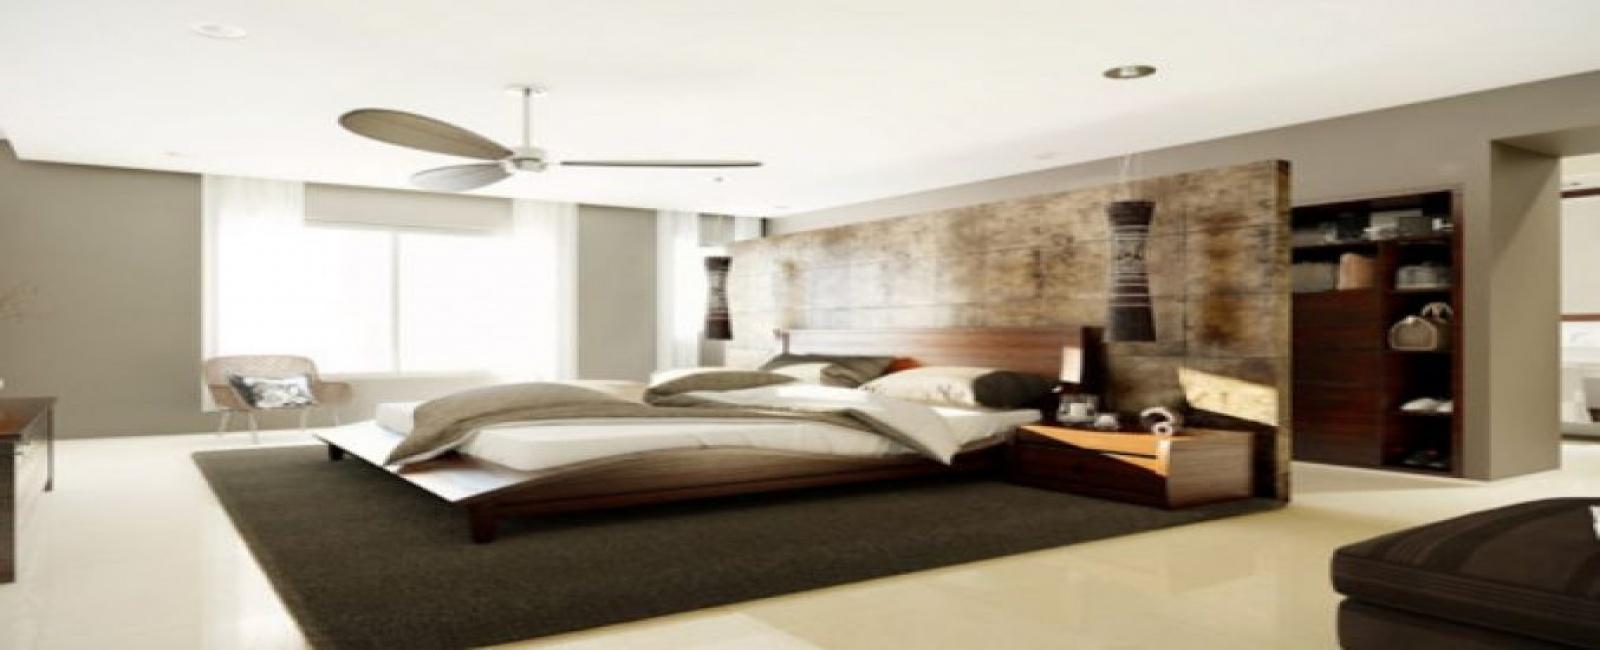 2316 West Jacobs Mill Drive, Kasteelbrakel, Ohio, 4 Bedrooms Bedrooms, 7 Rooms Rooms,5 BathroomsBathrooms,Condos,For Sale,1006